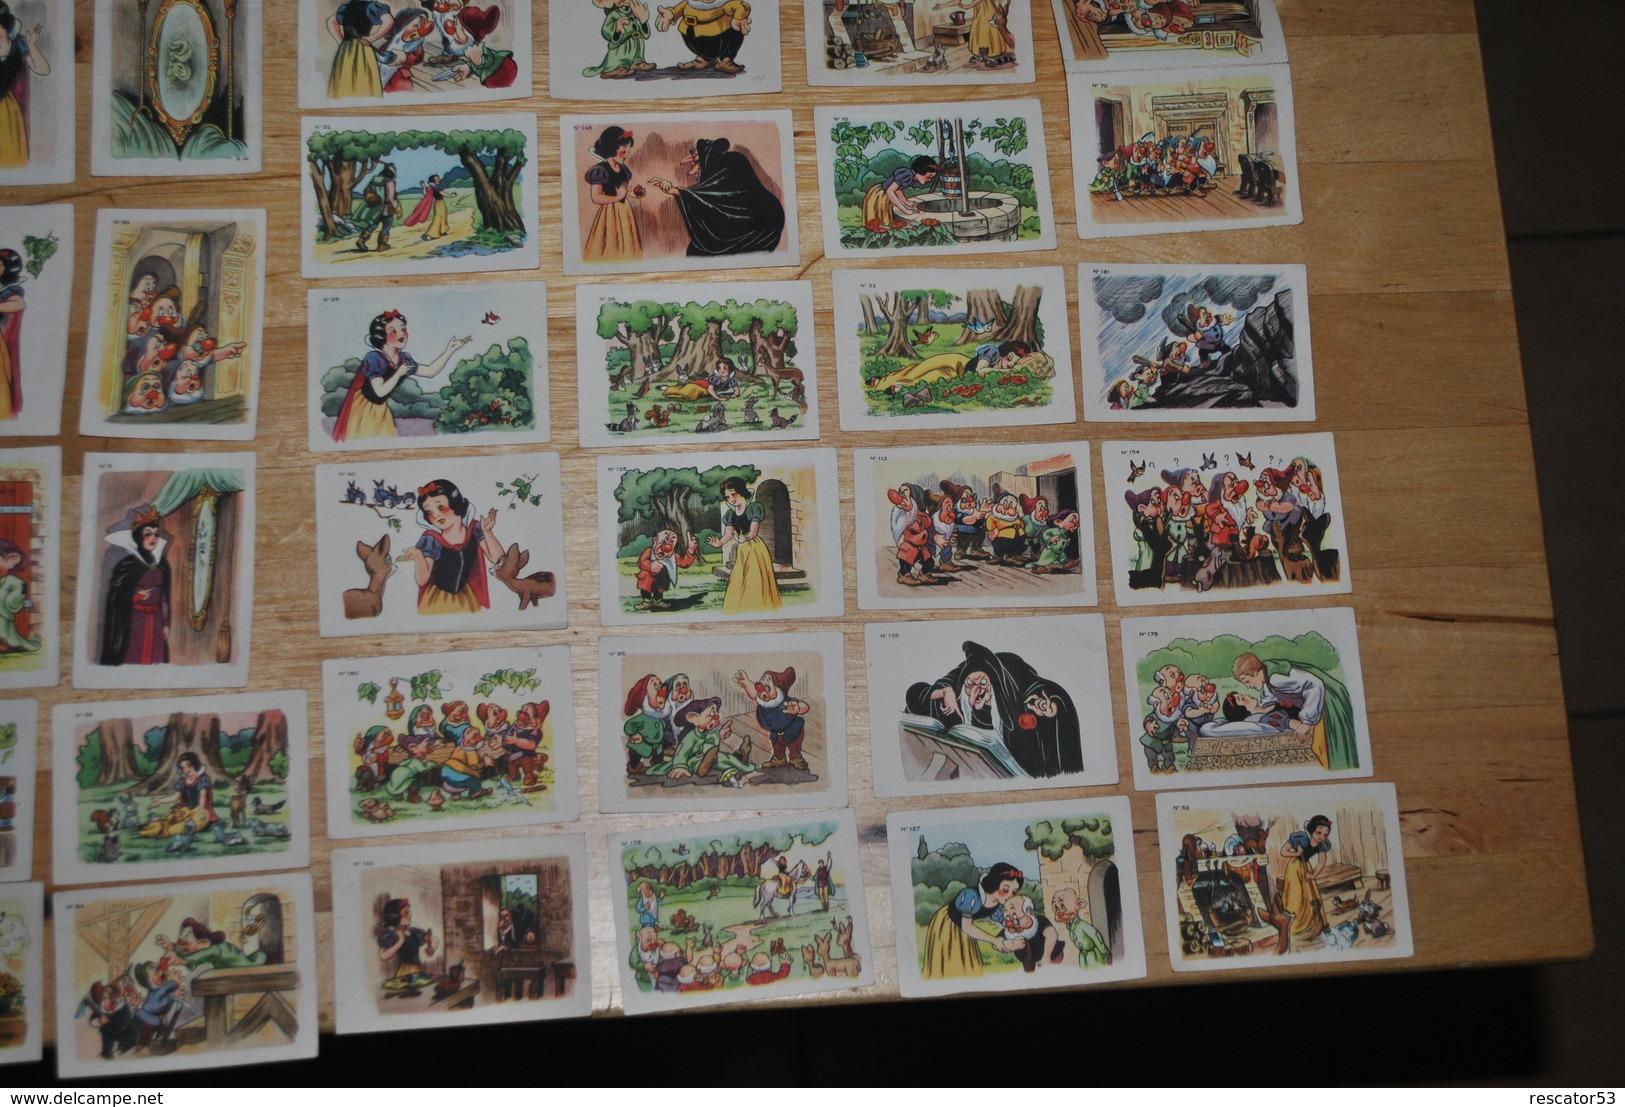 Rare 58 Vignettes Blanche-neige Et Les 7 Nains Walt-Disney Chocolat Menier - Sammelbilder, Sticker